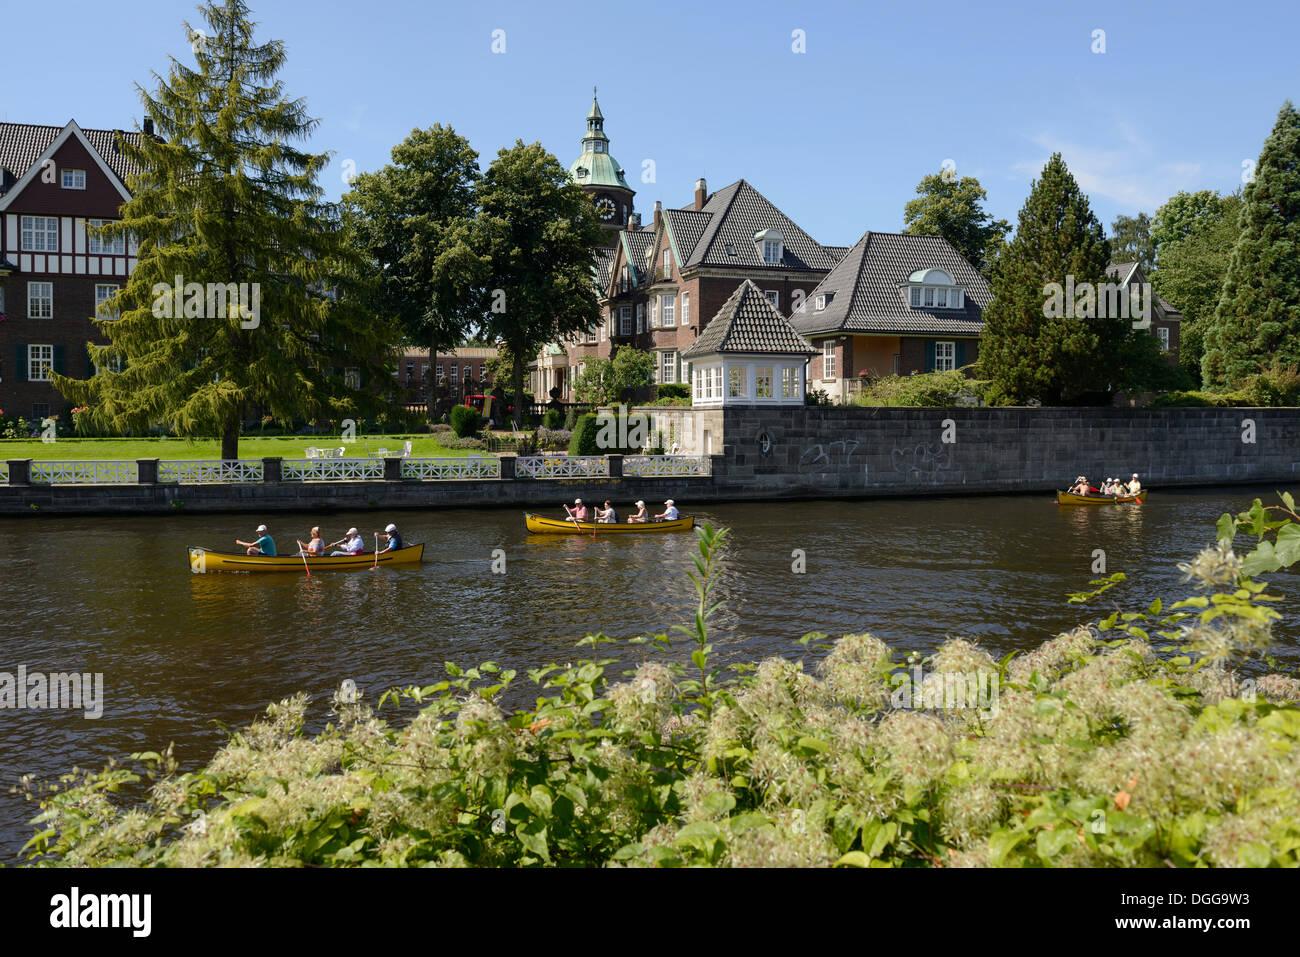 St. Johannis monastery, kayakers paddling on the Alster river, Leinpfad walkway, Hamburg, Hamburg, Germany Stock Photo